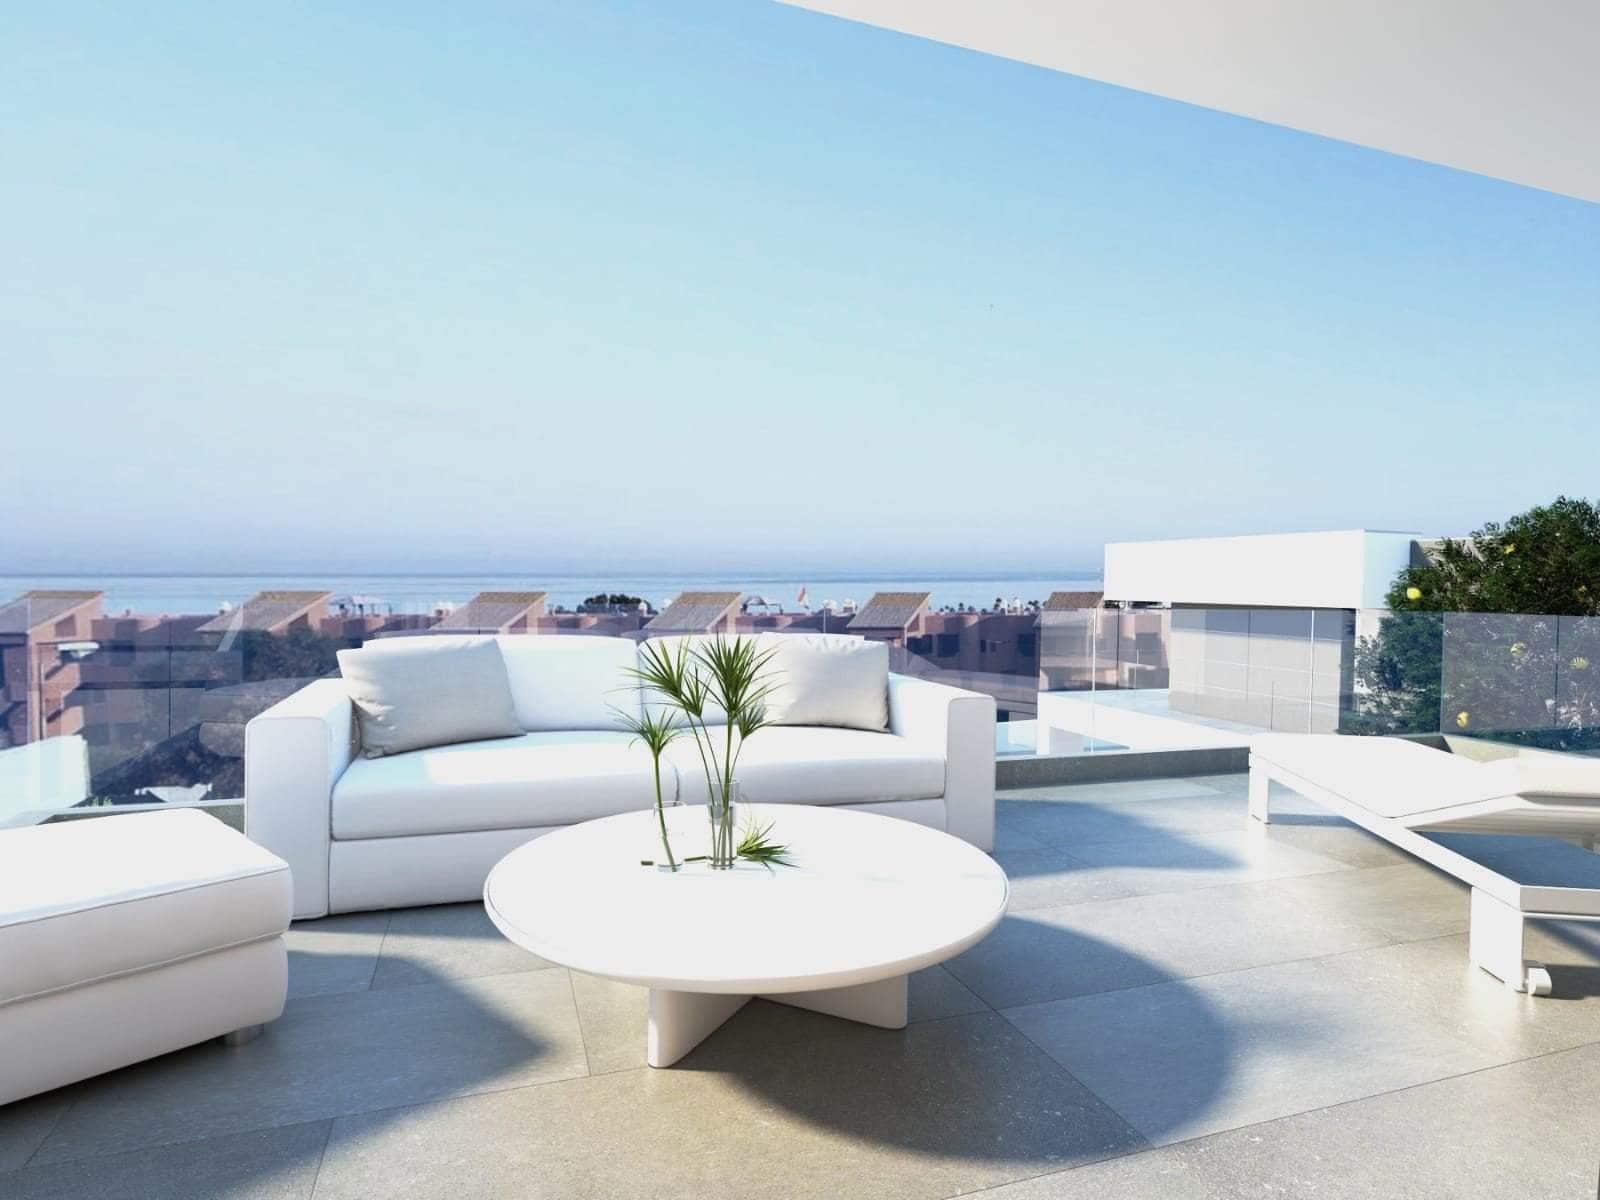 4 bedroom Townhouse for sale in Manilva - € 385,000 (Ref: 4461717)